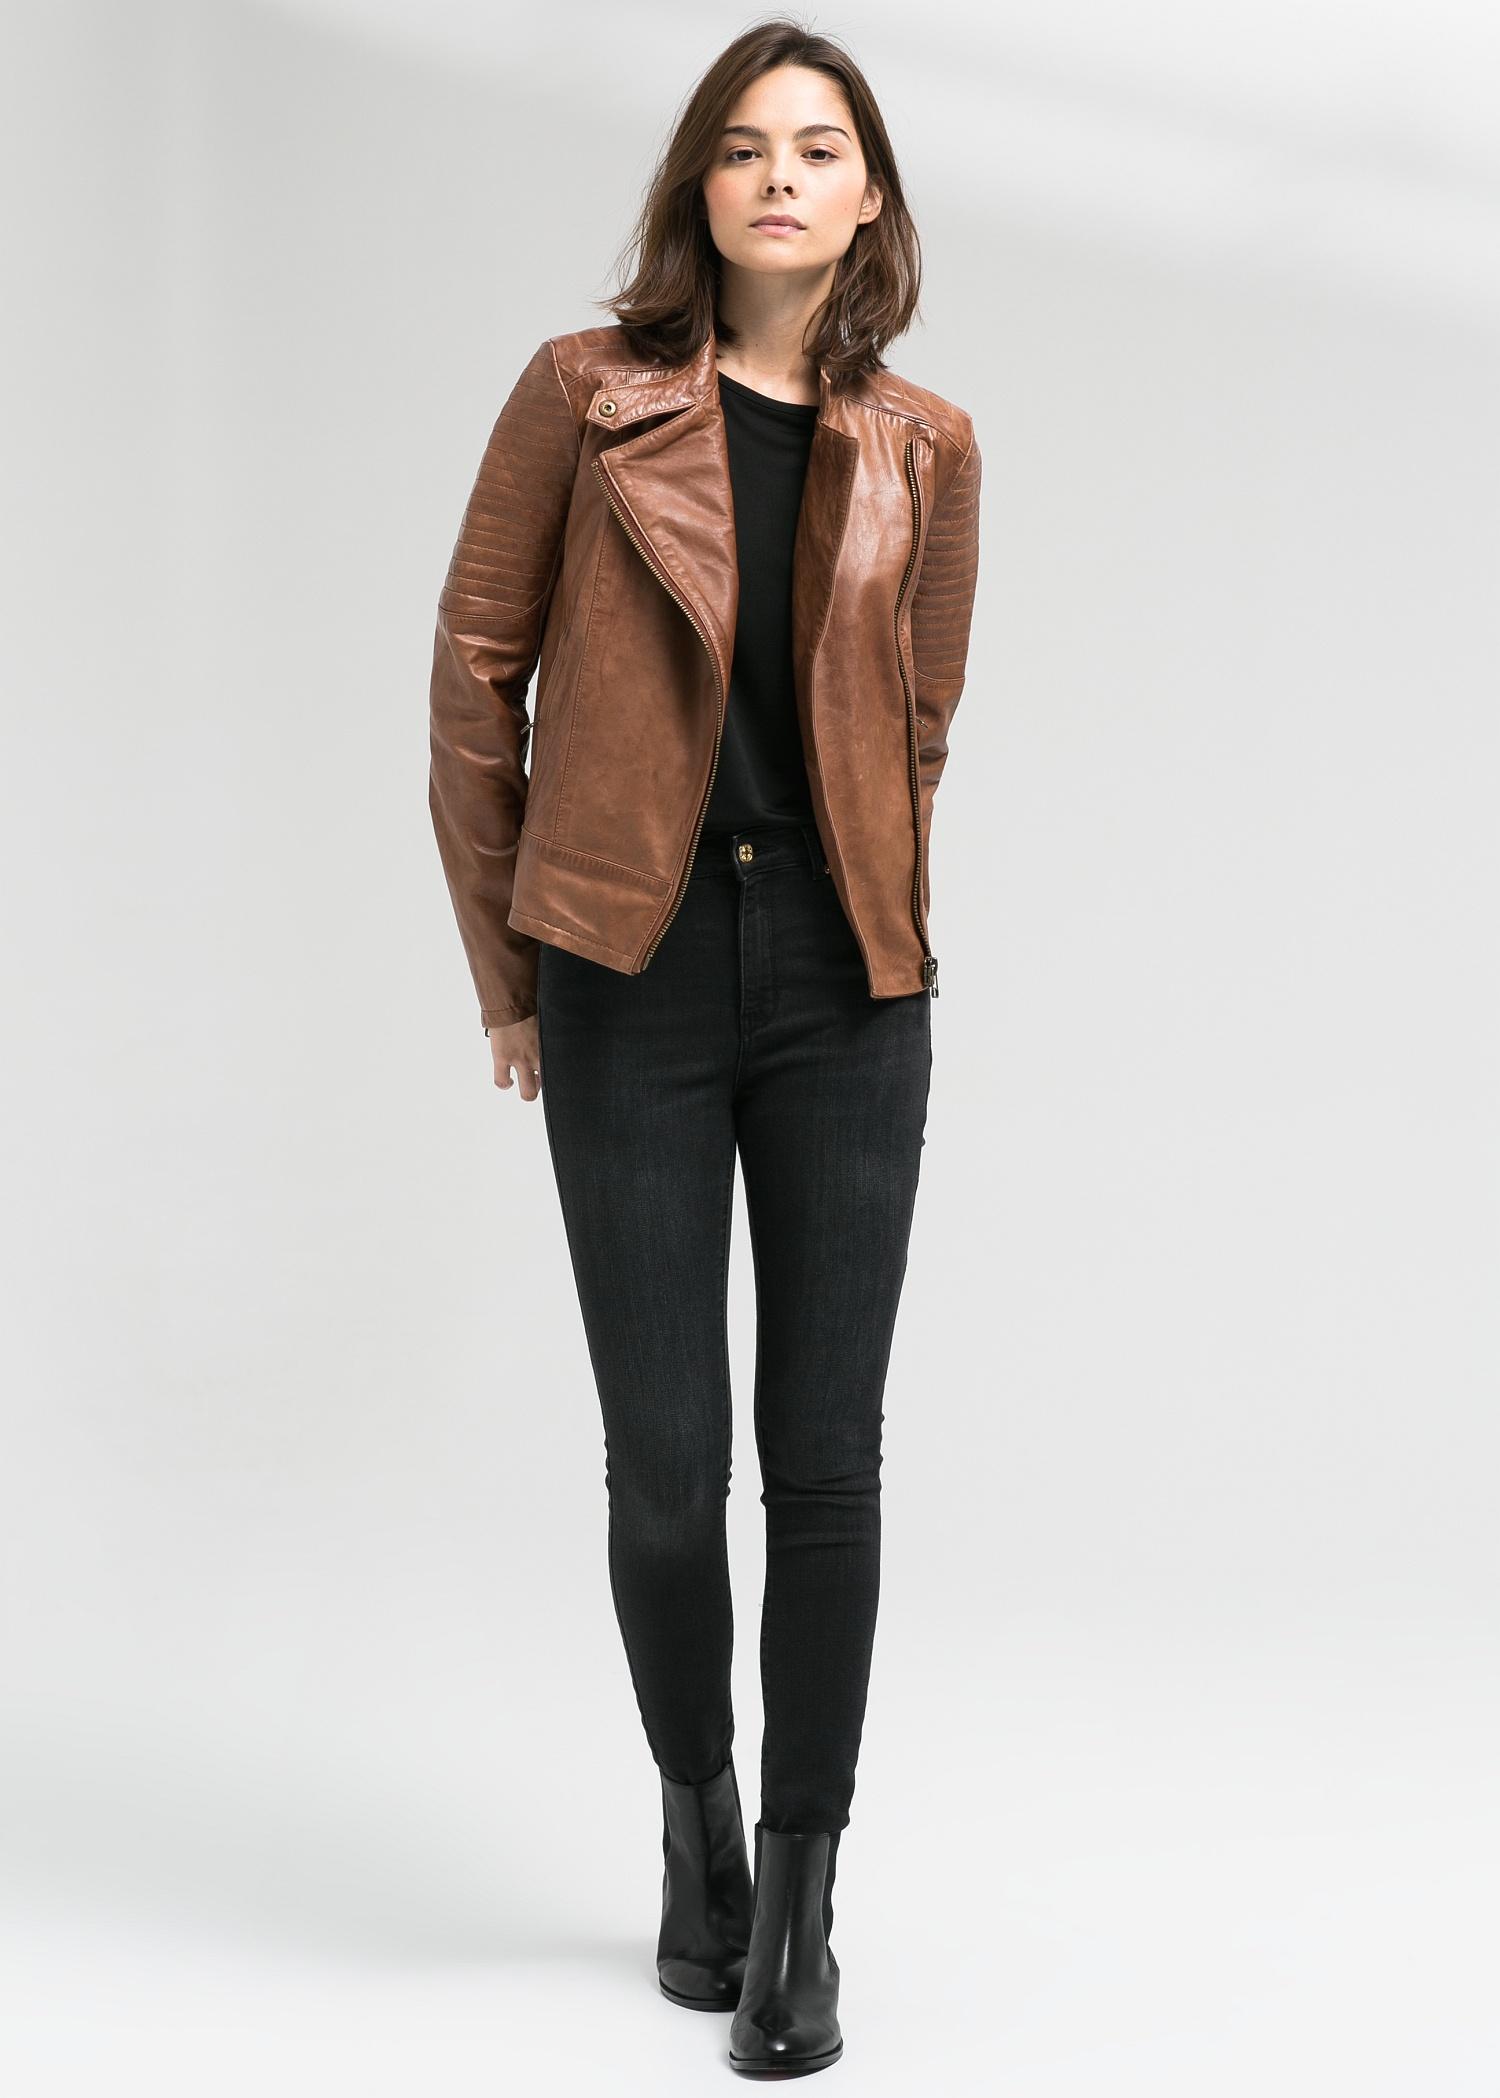 Mango Leather Biker Jacket In Cognac Brown Lyst